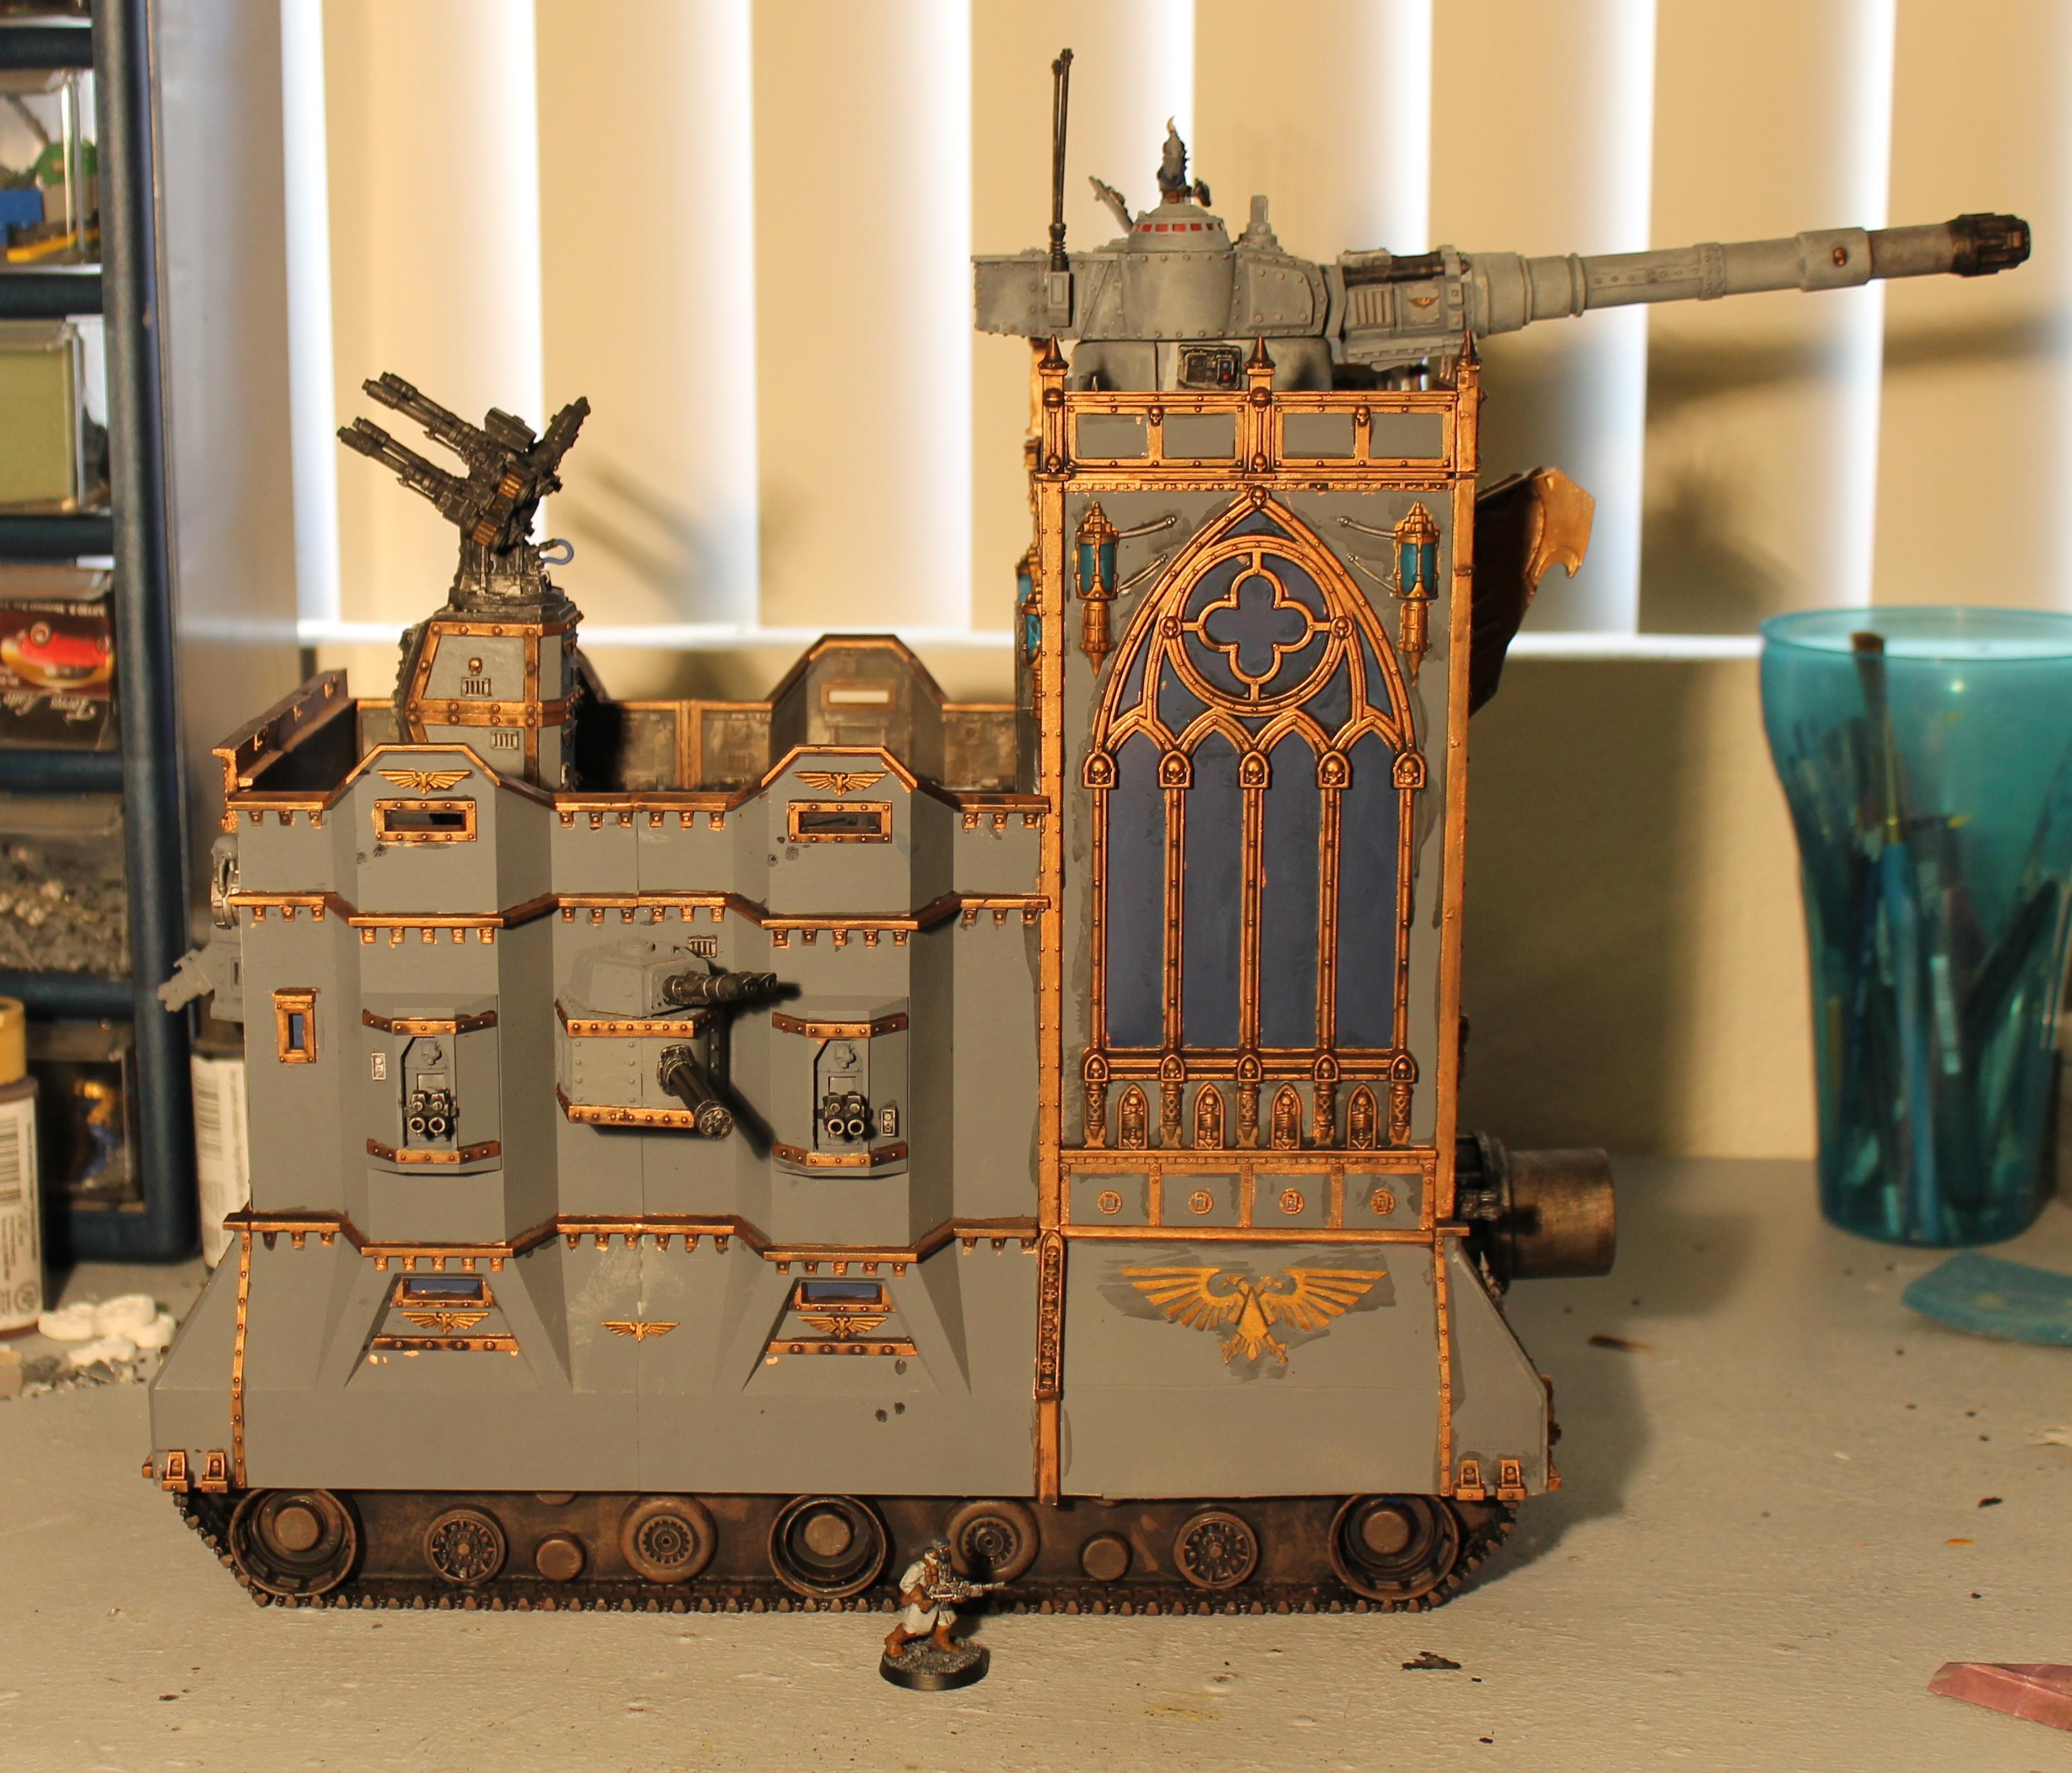 Imperial Guard, Leviathan, Super-heavy